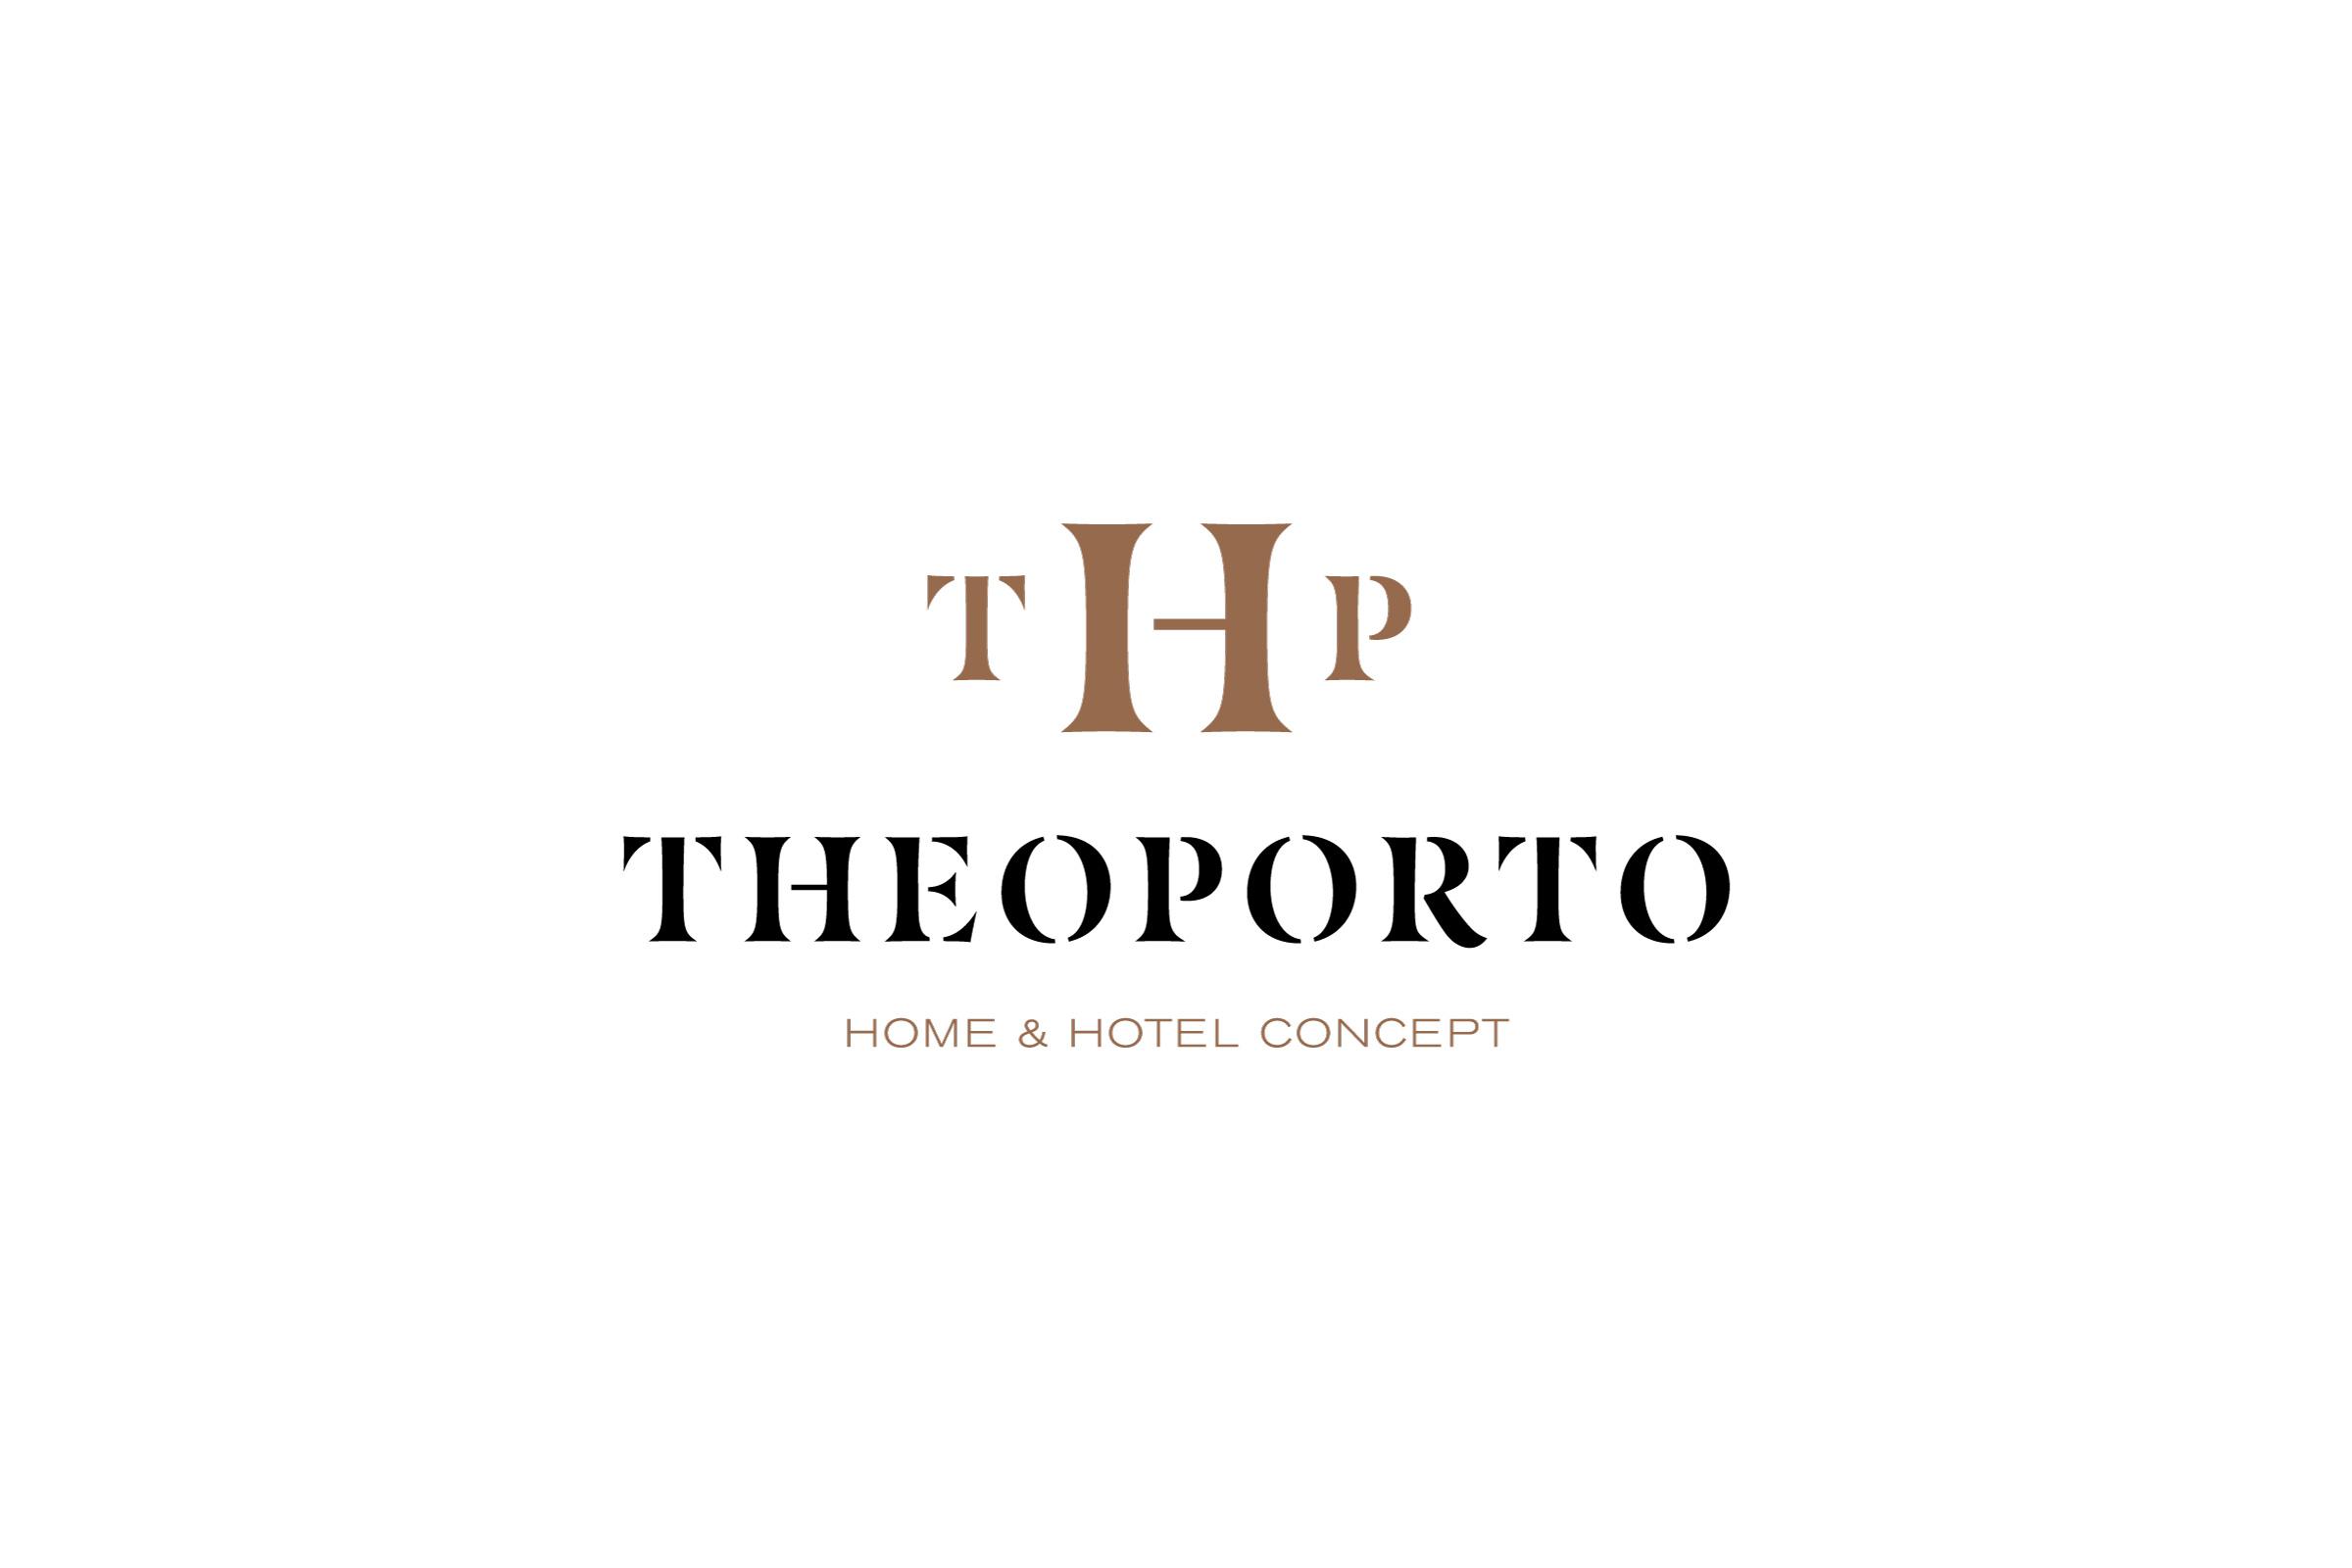 Theoporto